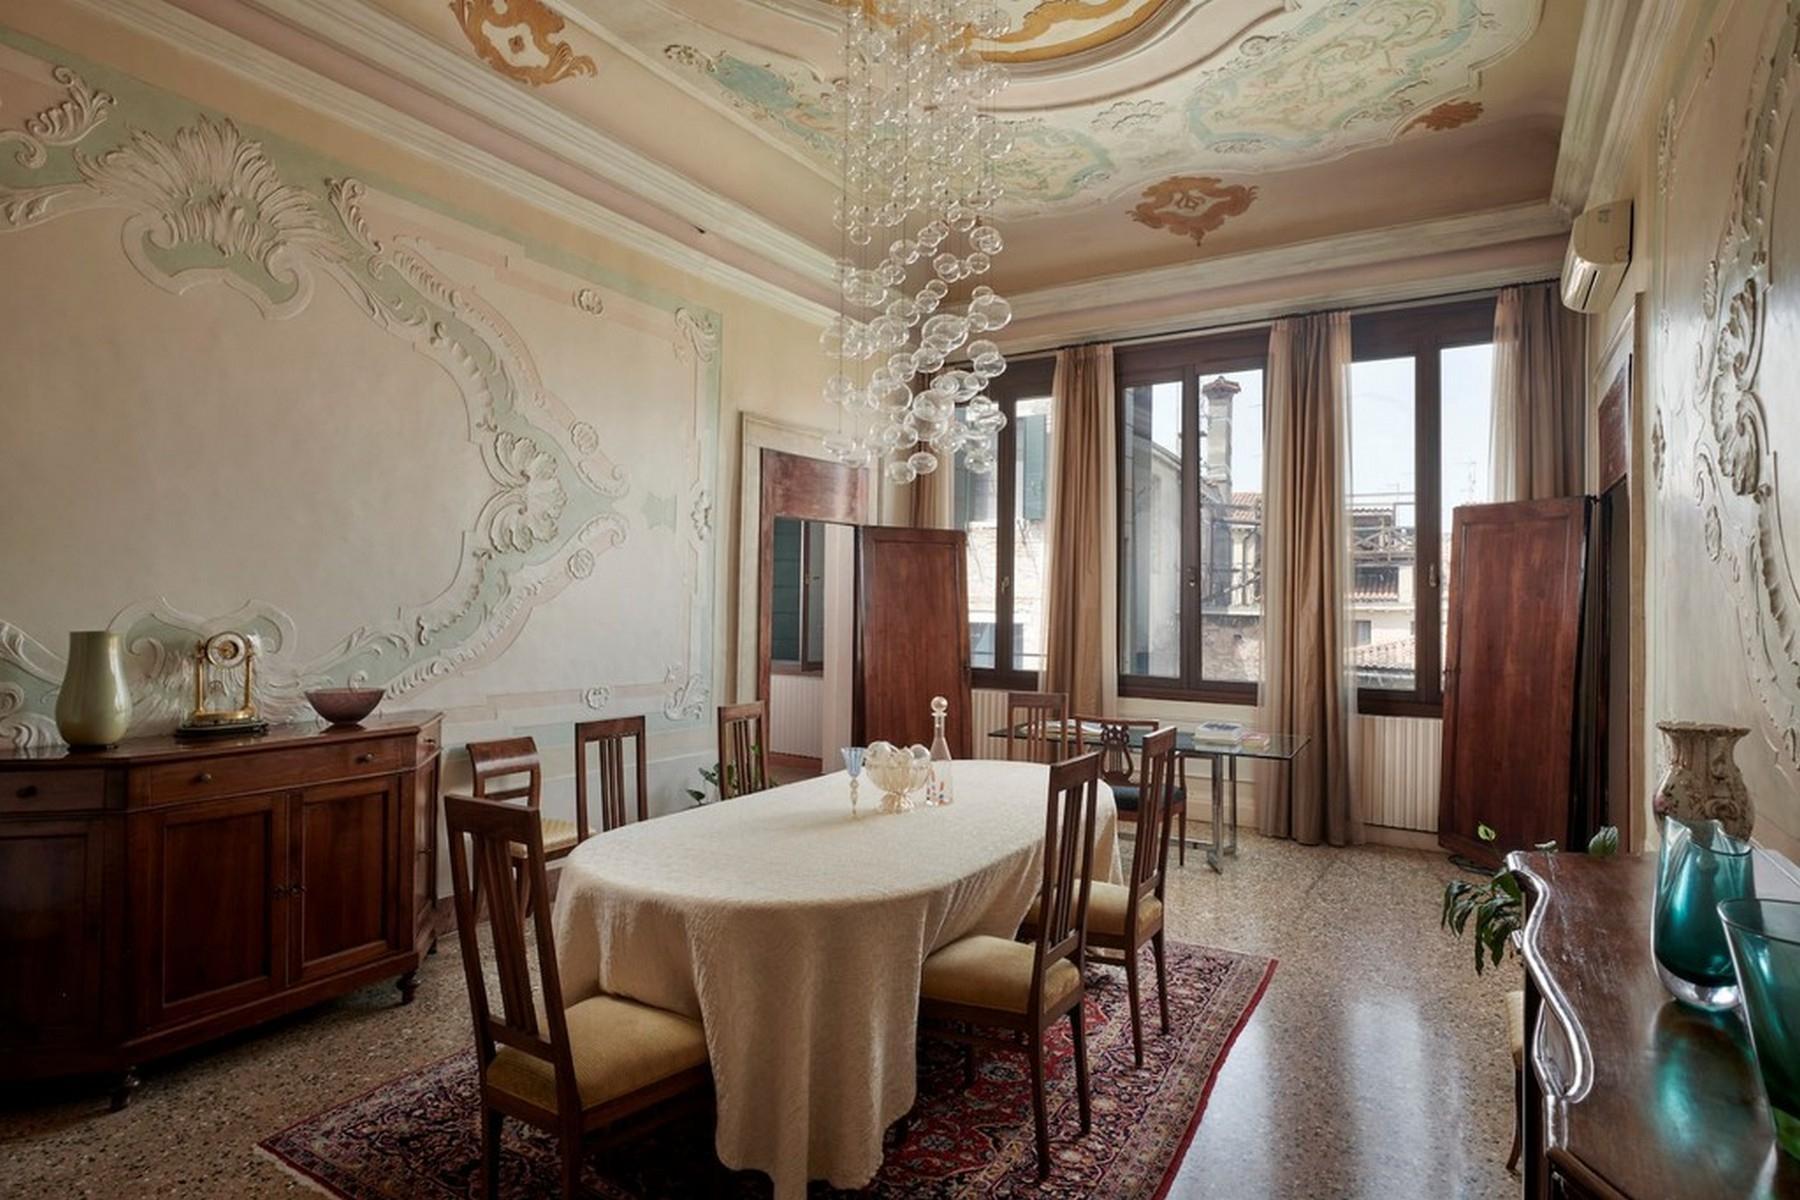 Elegante secondo Piano Nobile in un Palazzo - 7